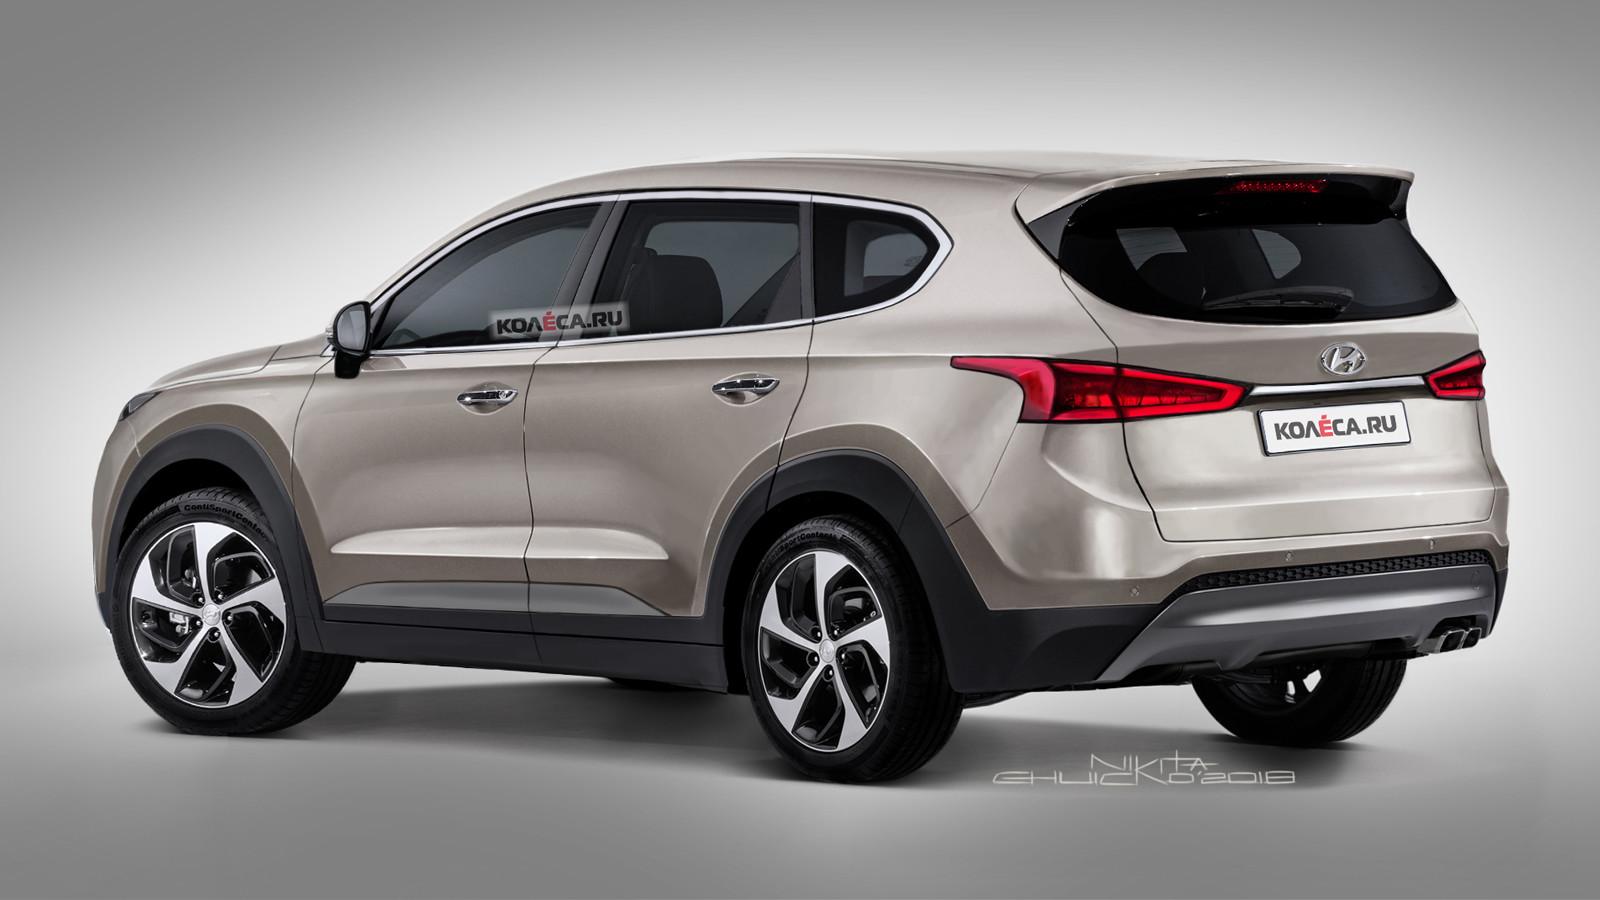 http://www.kolesa.ru/uploads/2018/02/Hyundai-Santa-Fe-rear1-1600x0-c-default.jpg